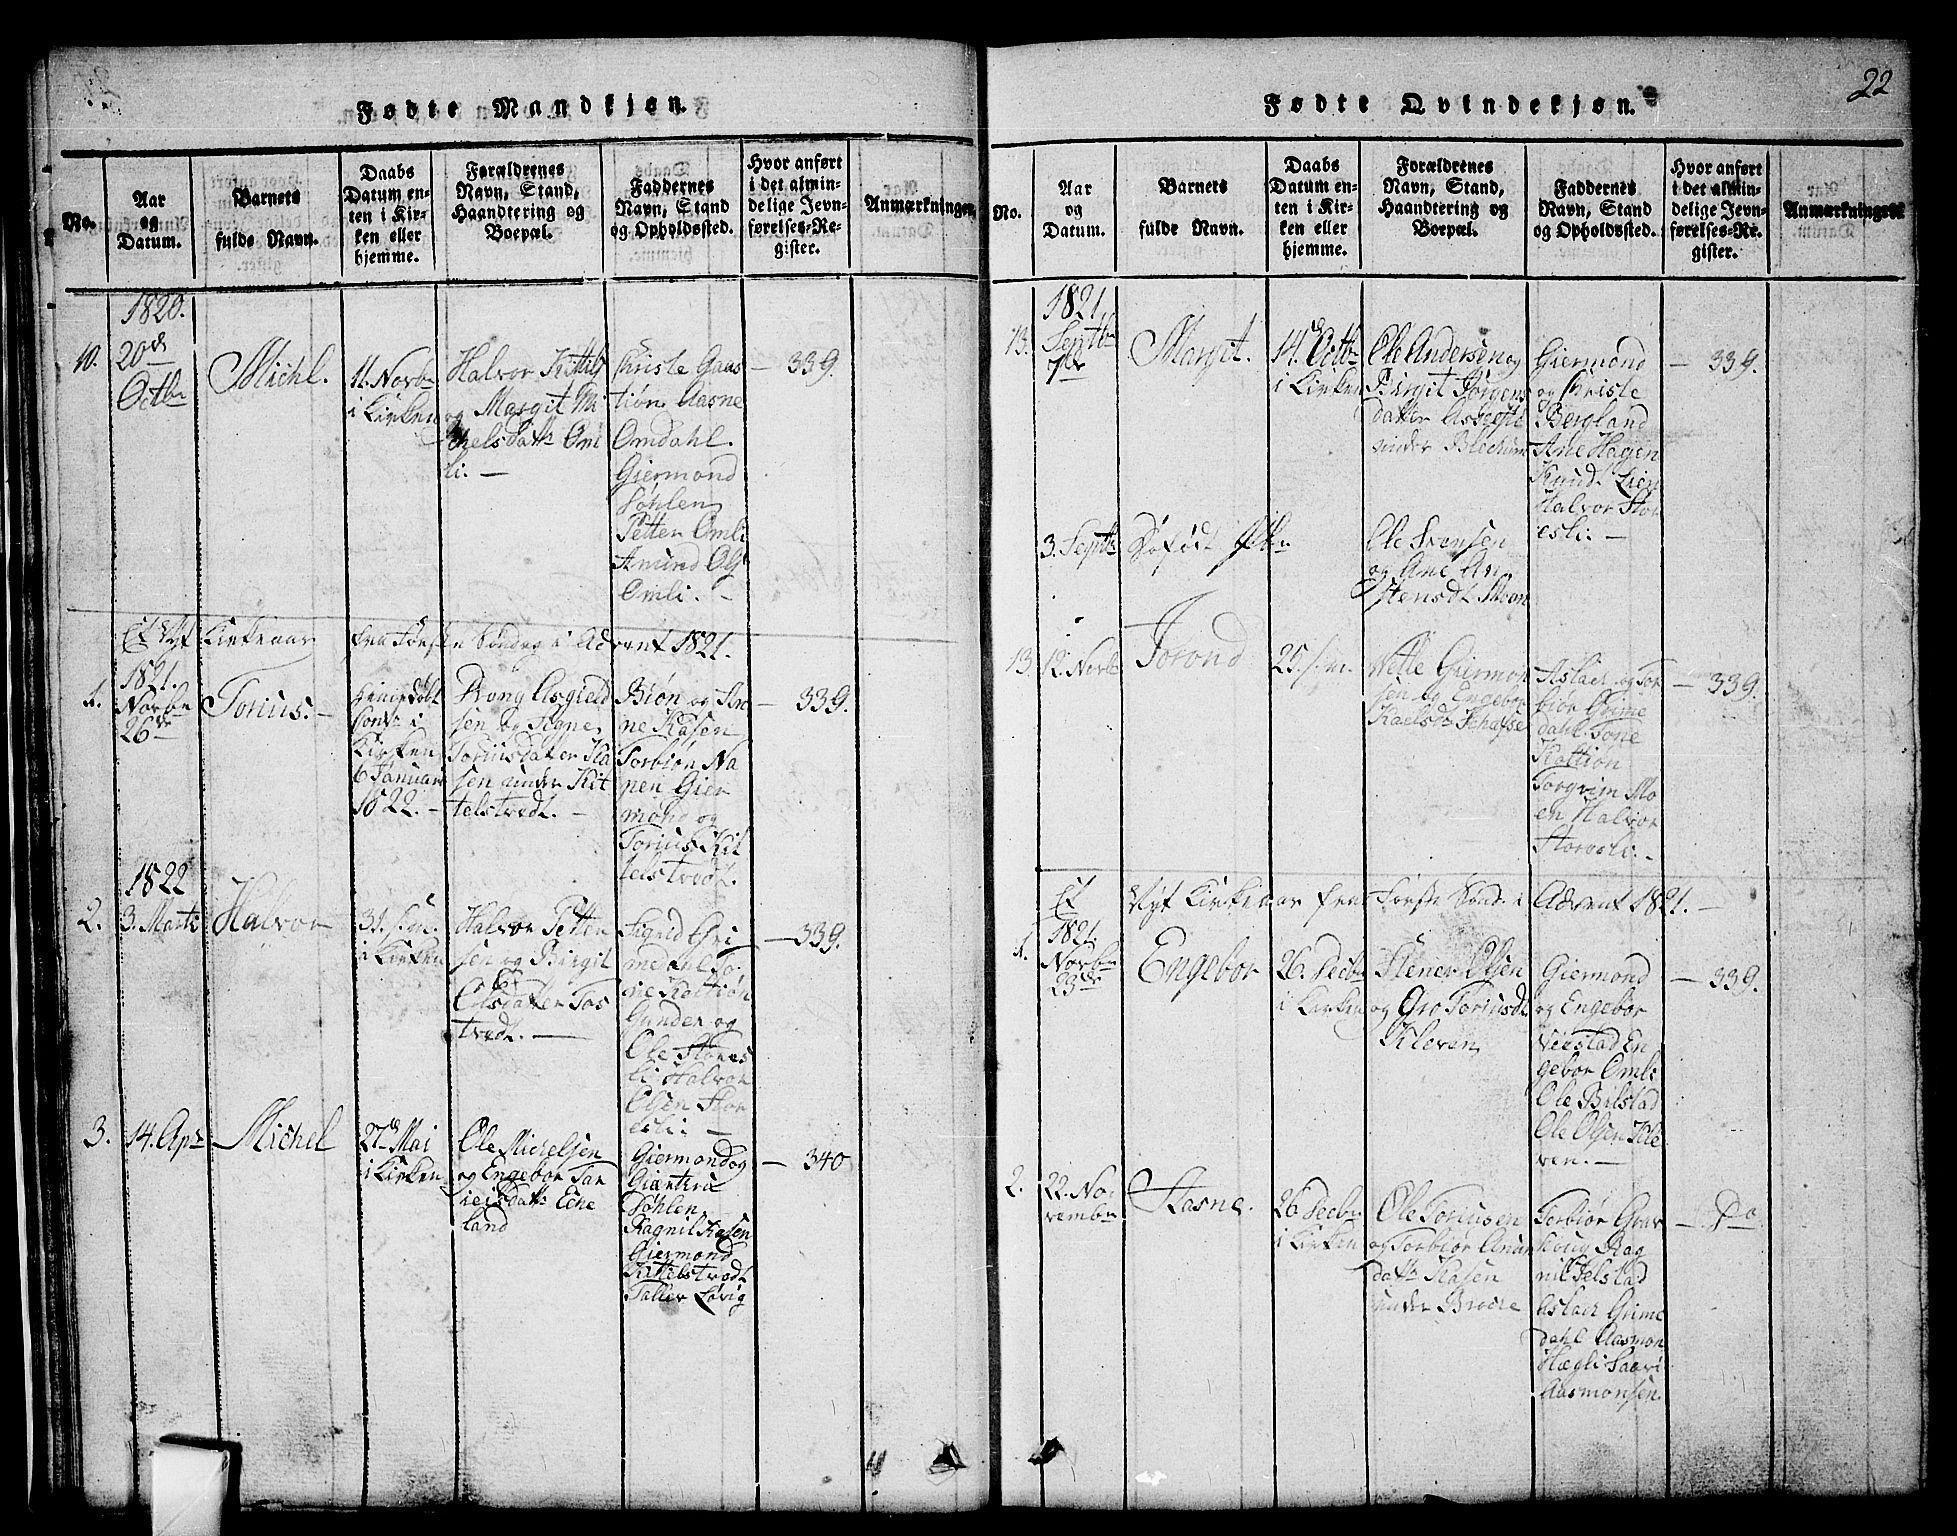 SAKO, Mo kirkebøker, G/Gb/L0001: Klokkerbok nr. II 1, 1814-1843, s. 22